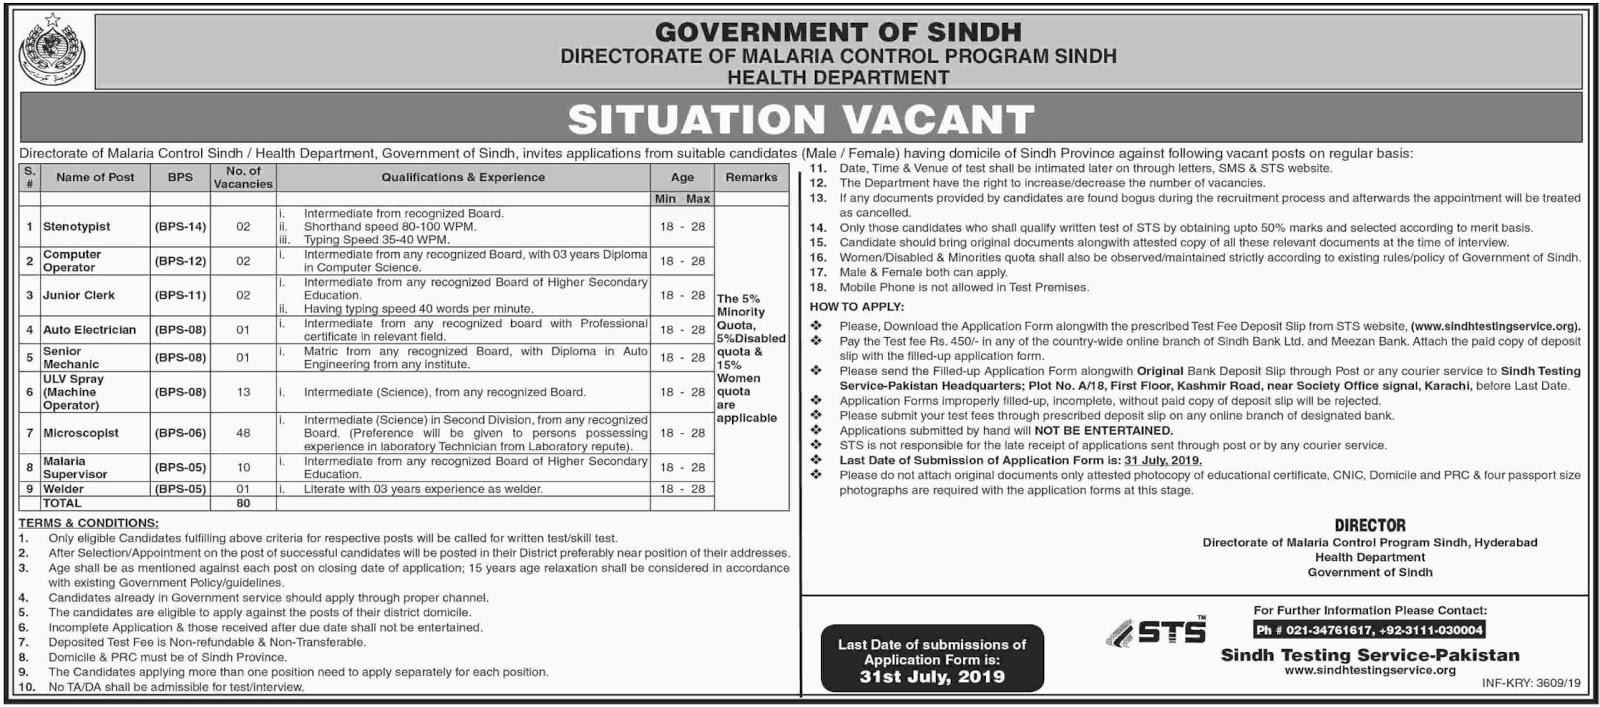 Sindh Health Department Jobs 2019 Directorate of Malaria Control Program Latest